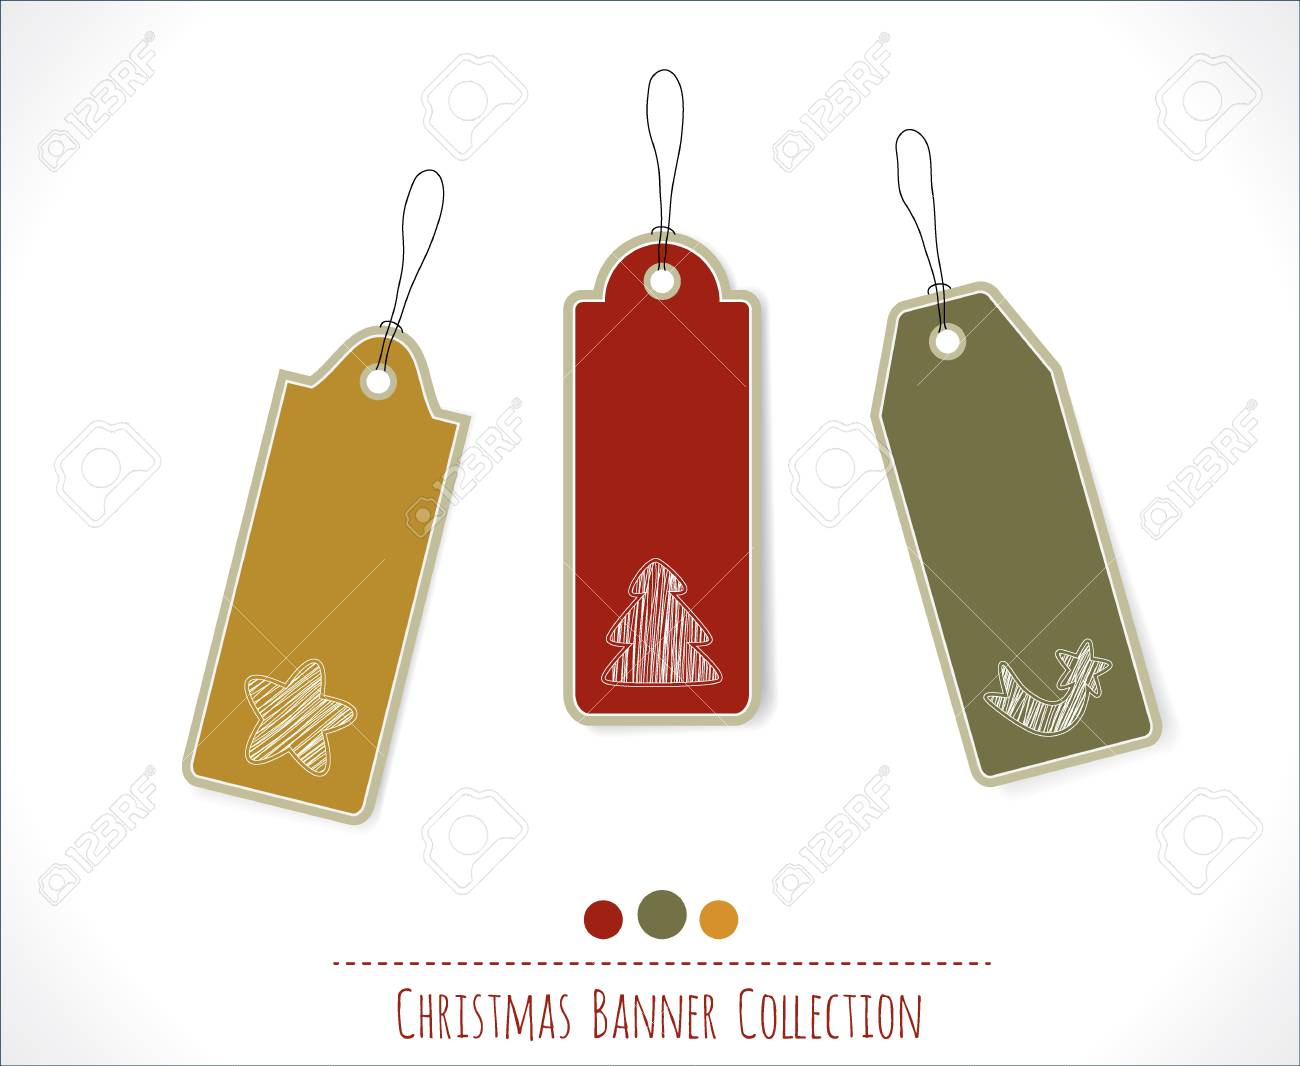 Christmas banner collection Stock Vector - 16082463